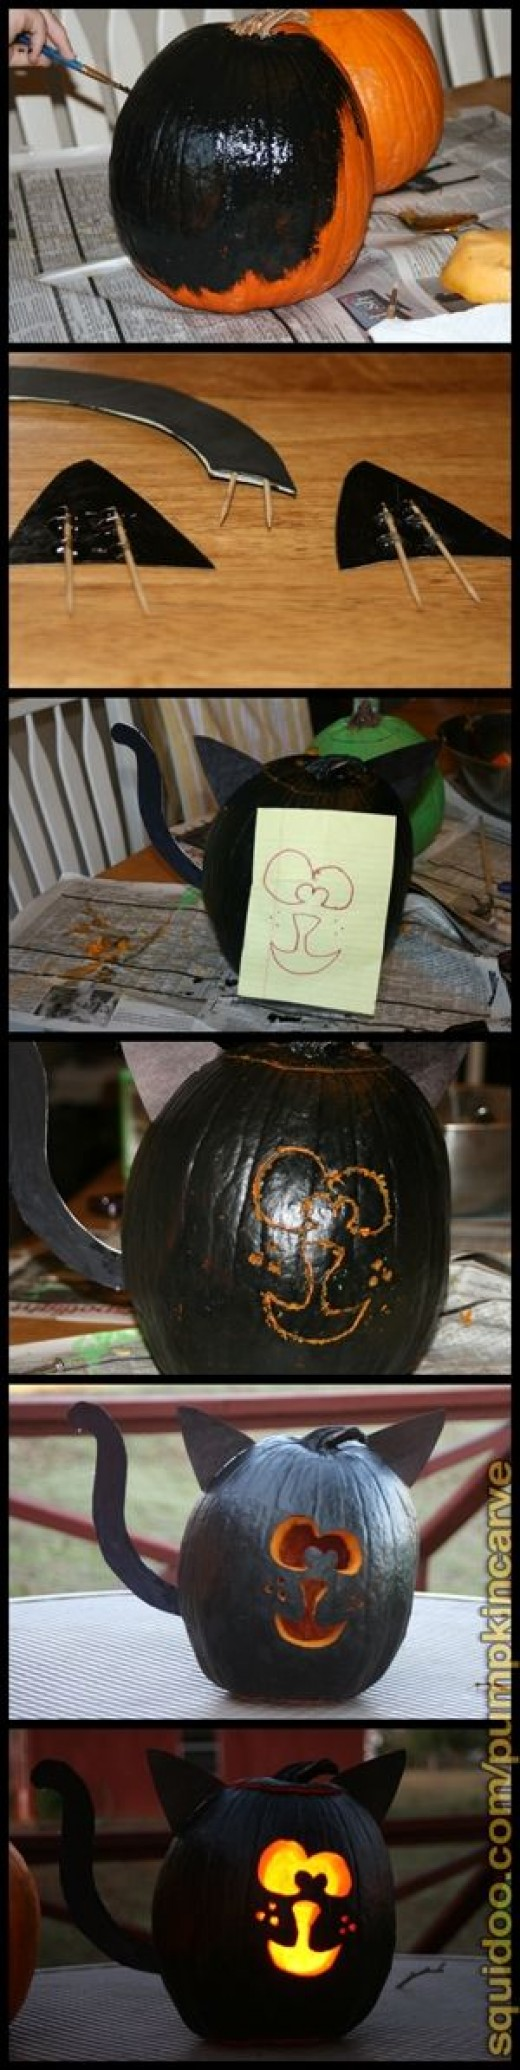 Our black cat carving. Painted Cat Face Pumpkin.